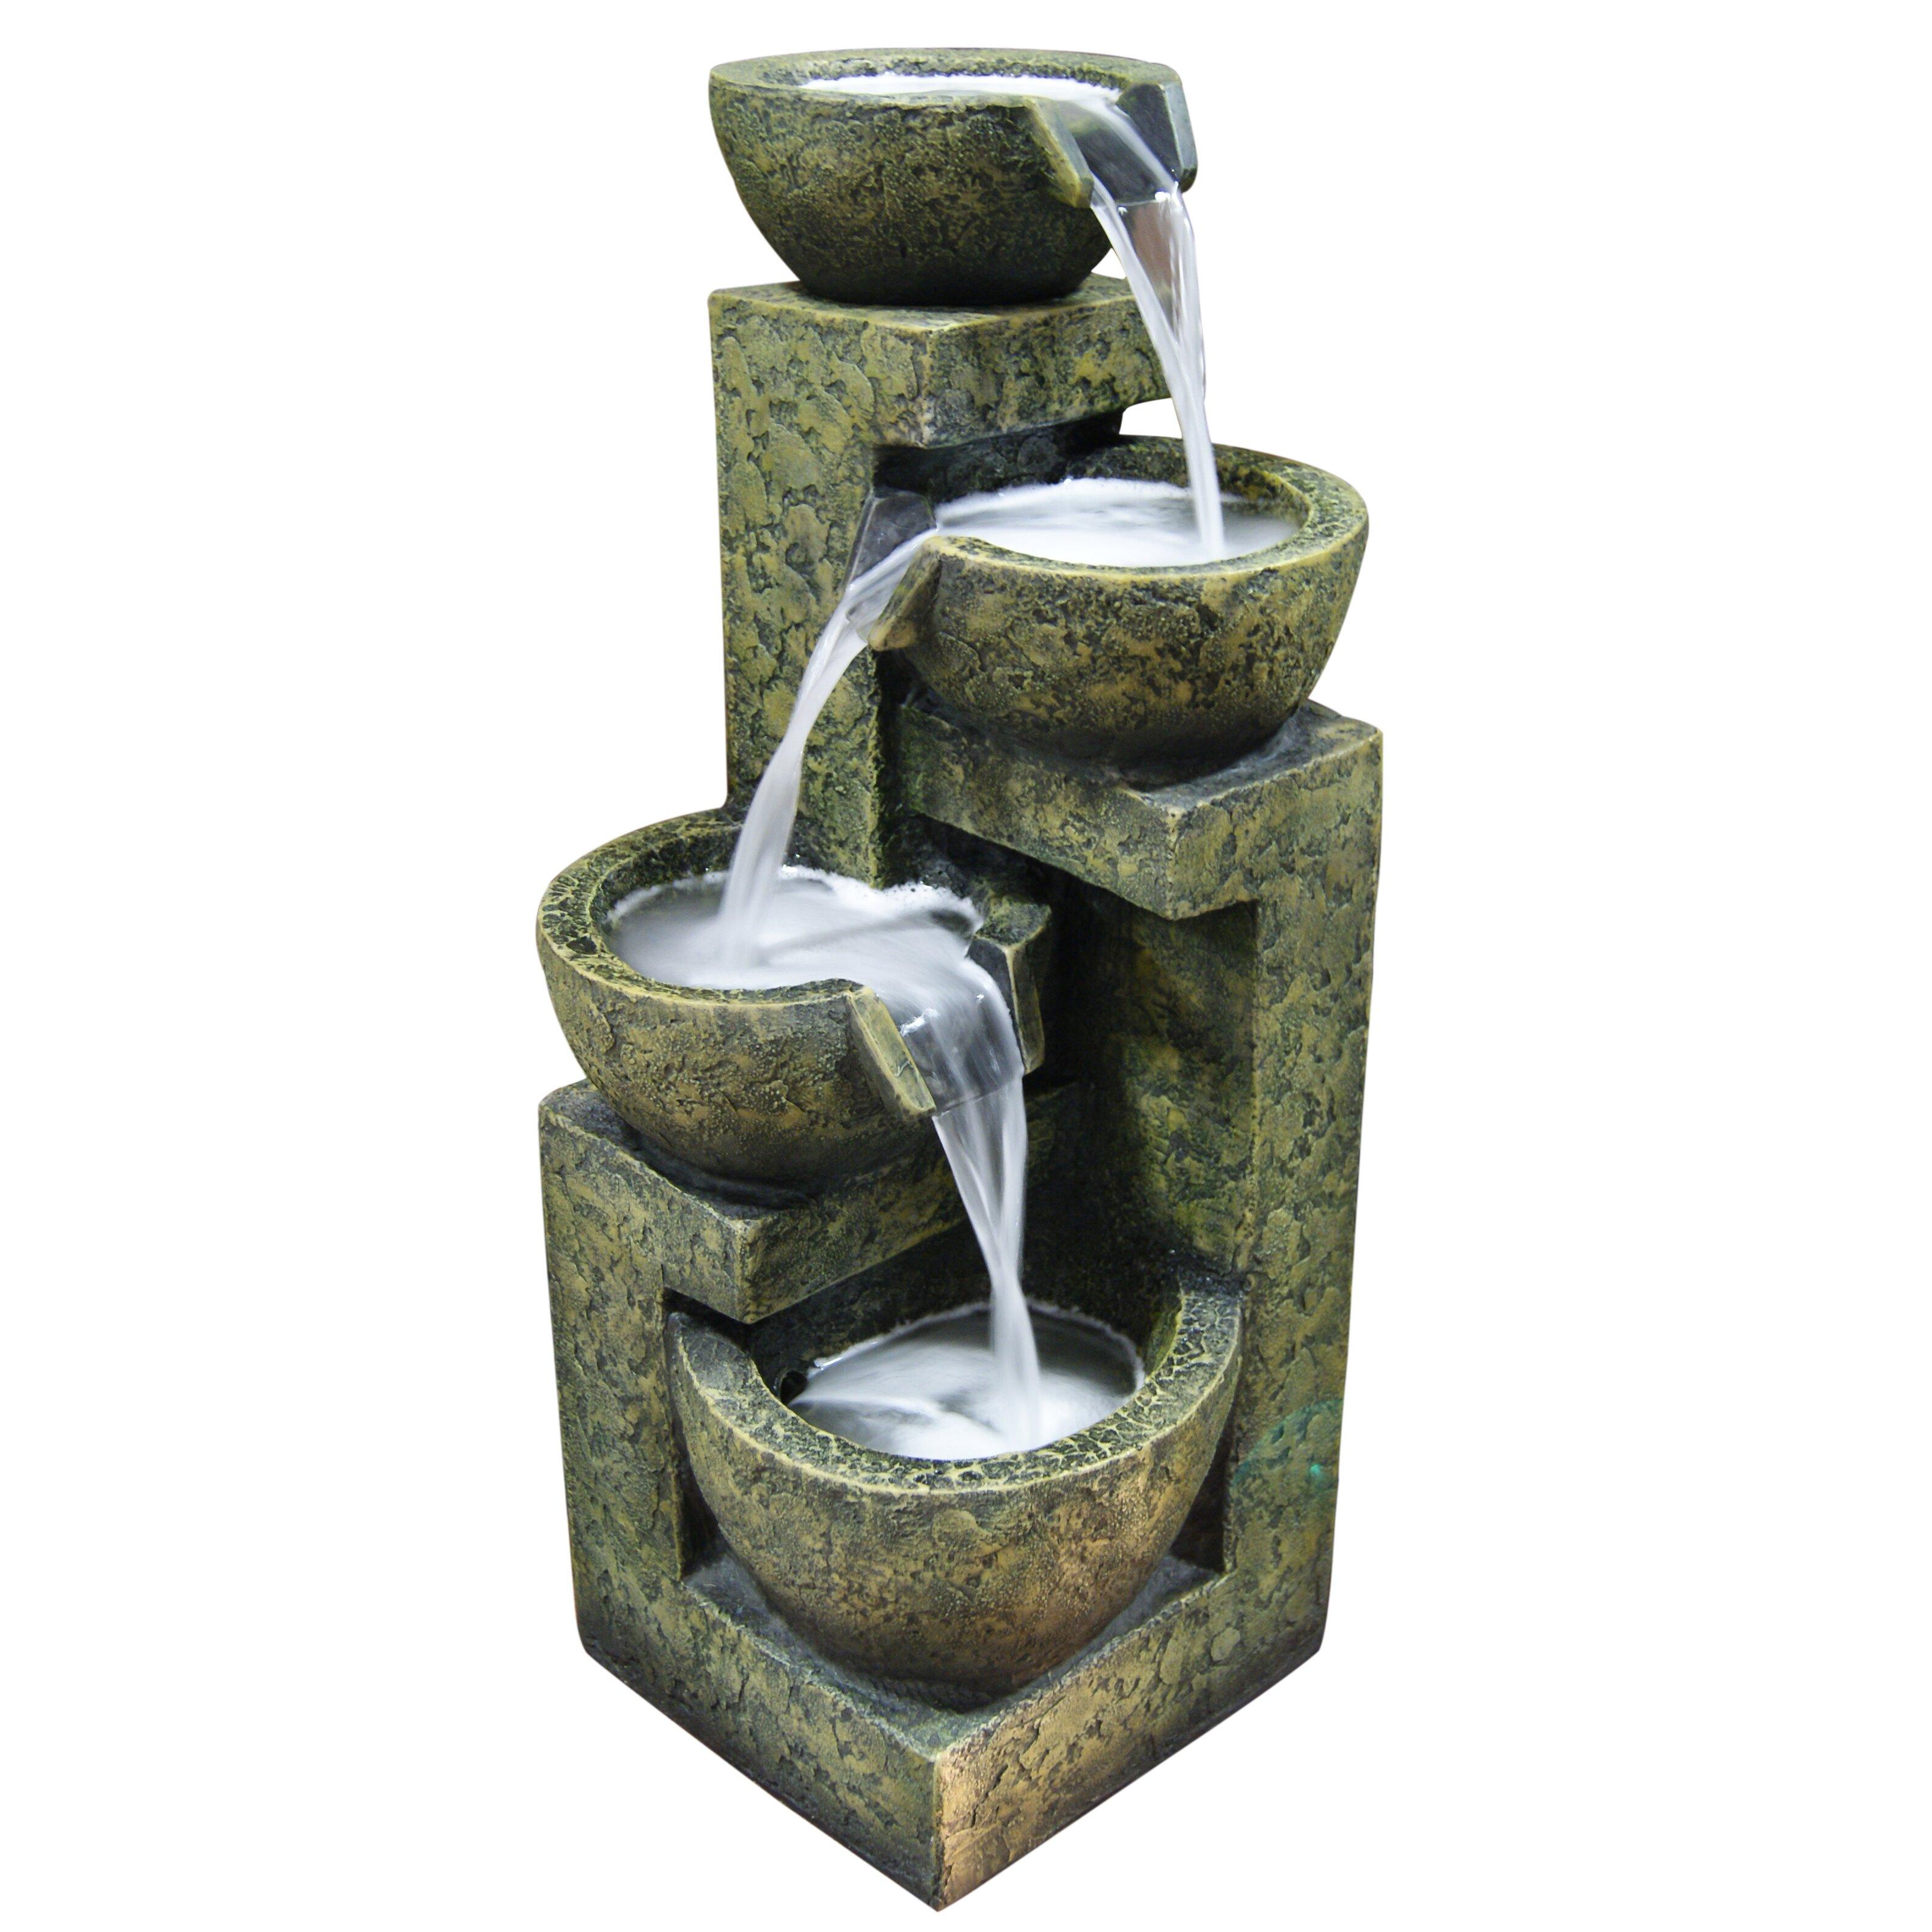 Water fountains calgary - Fiberglass Polystone Three Tier Water Fountain